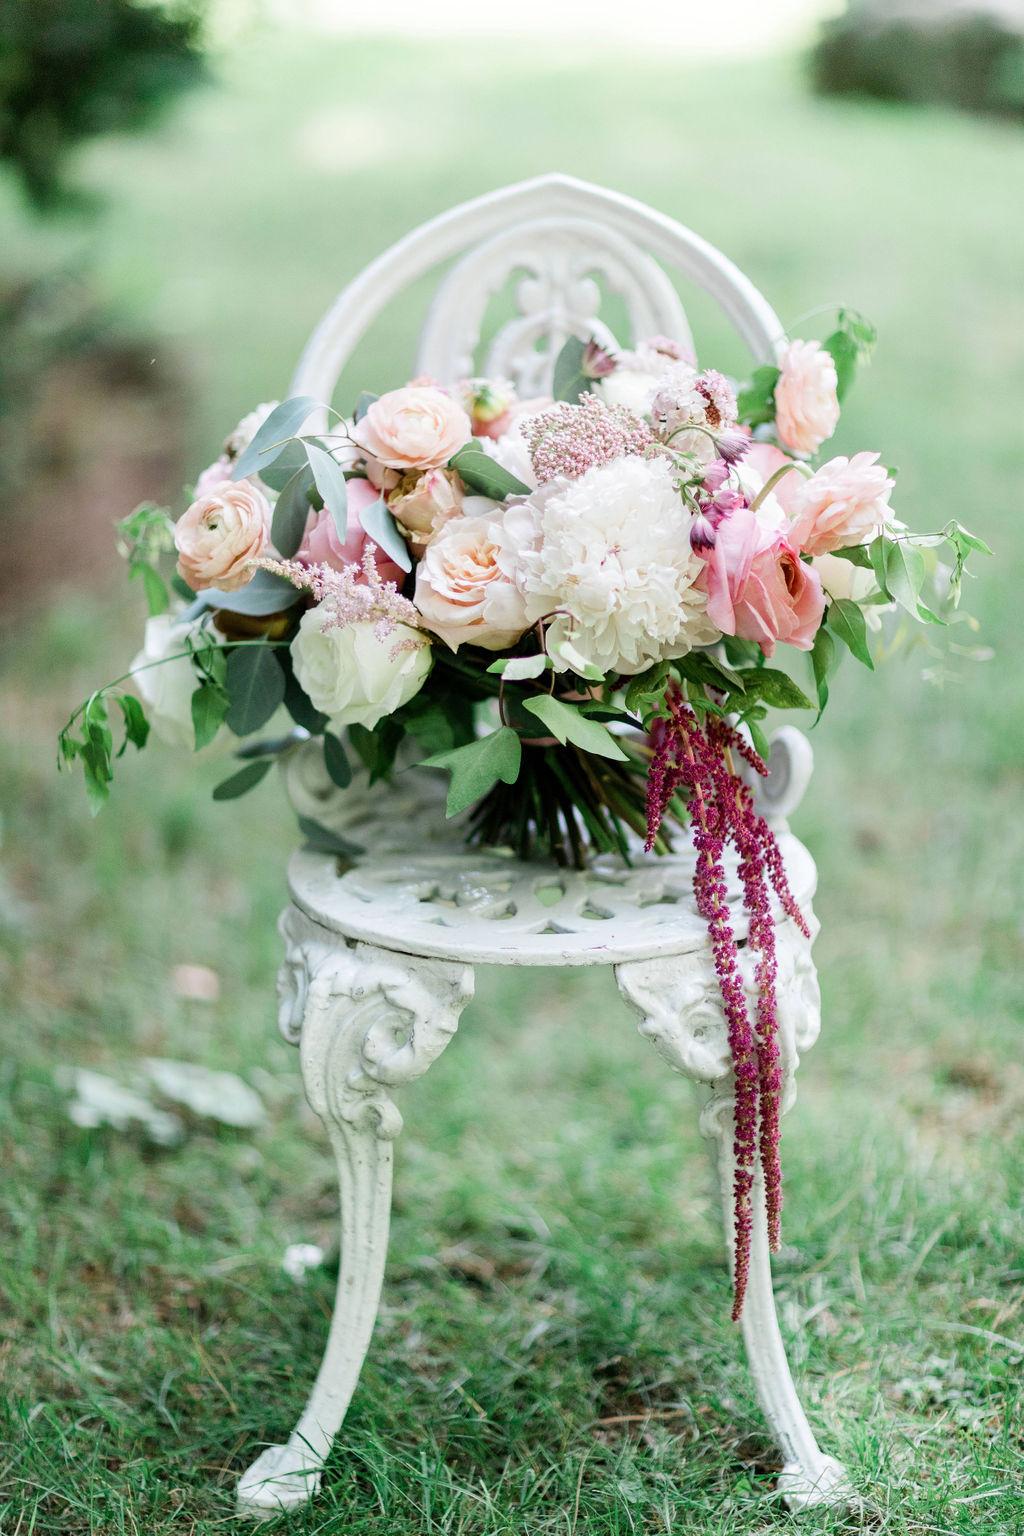 Kurtz-Orchards-Niagara-on-the-Lake-Styled-Wedding-Session-Shotlife-Studio-Calderone-Co-Luxury-Events-Vineyard-Bride-01.JPG